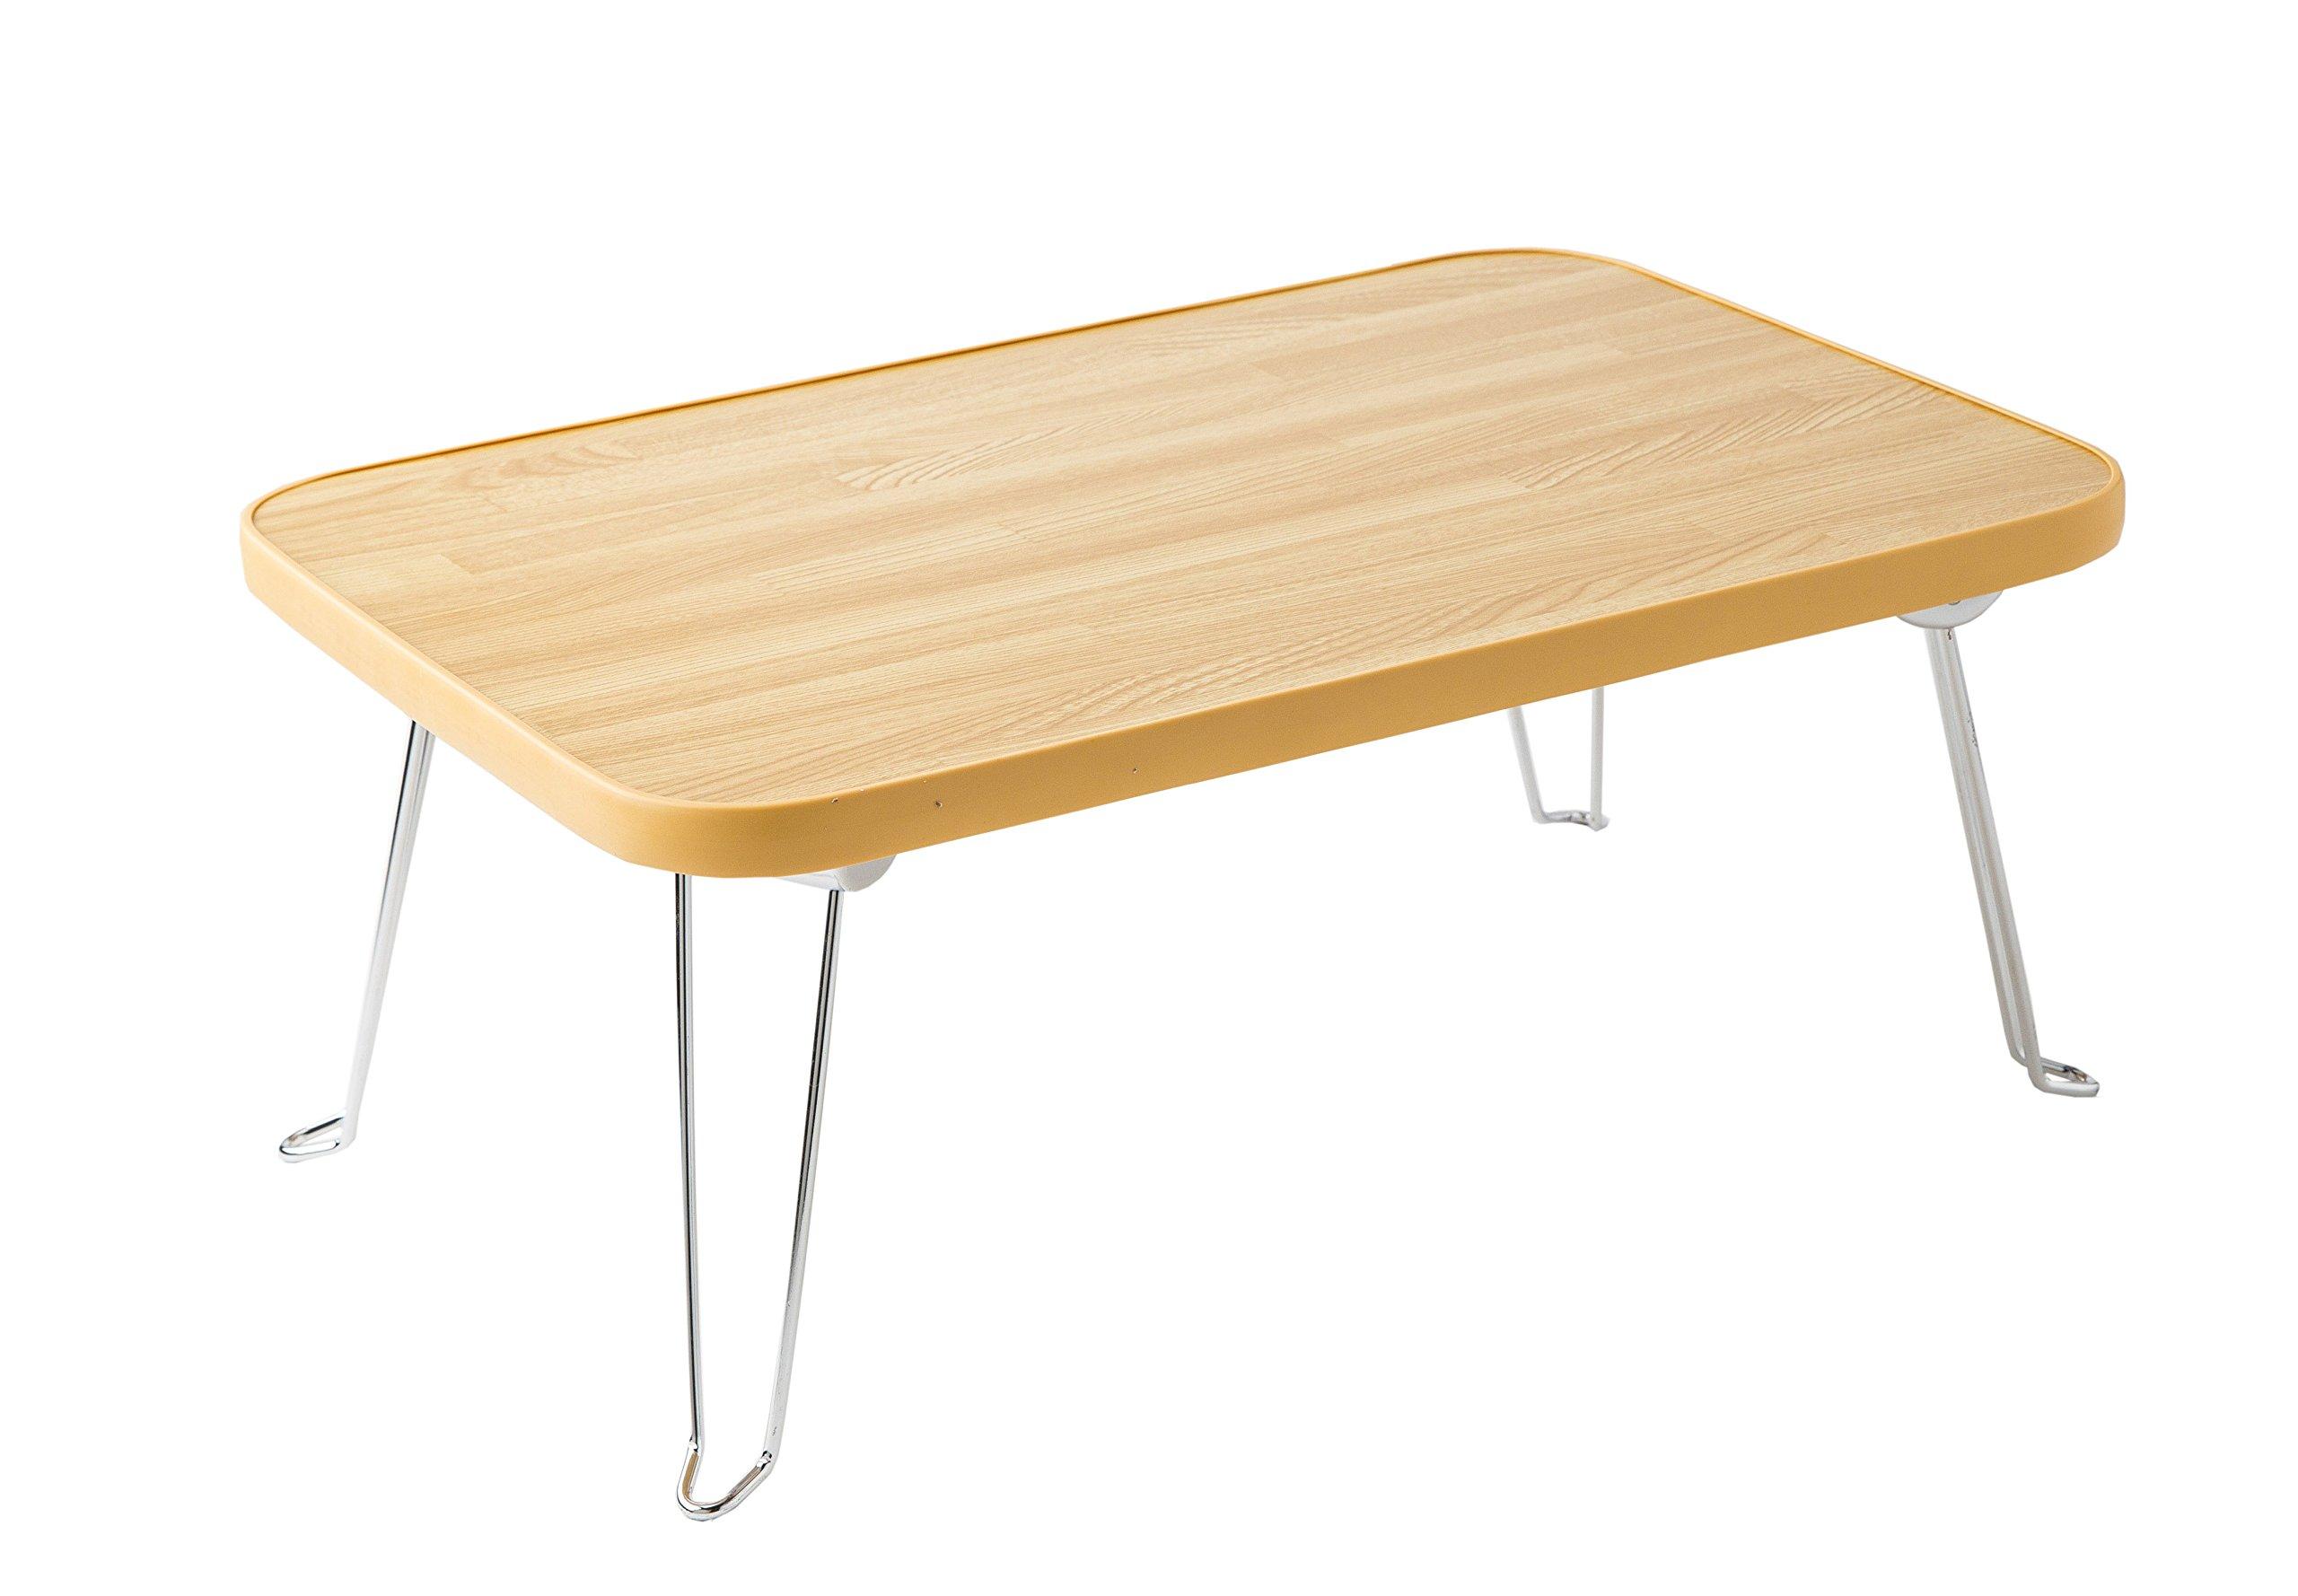 MISM ミニテーブル 寄木柄 45×30cm CTY-4530